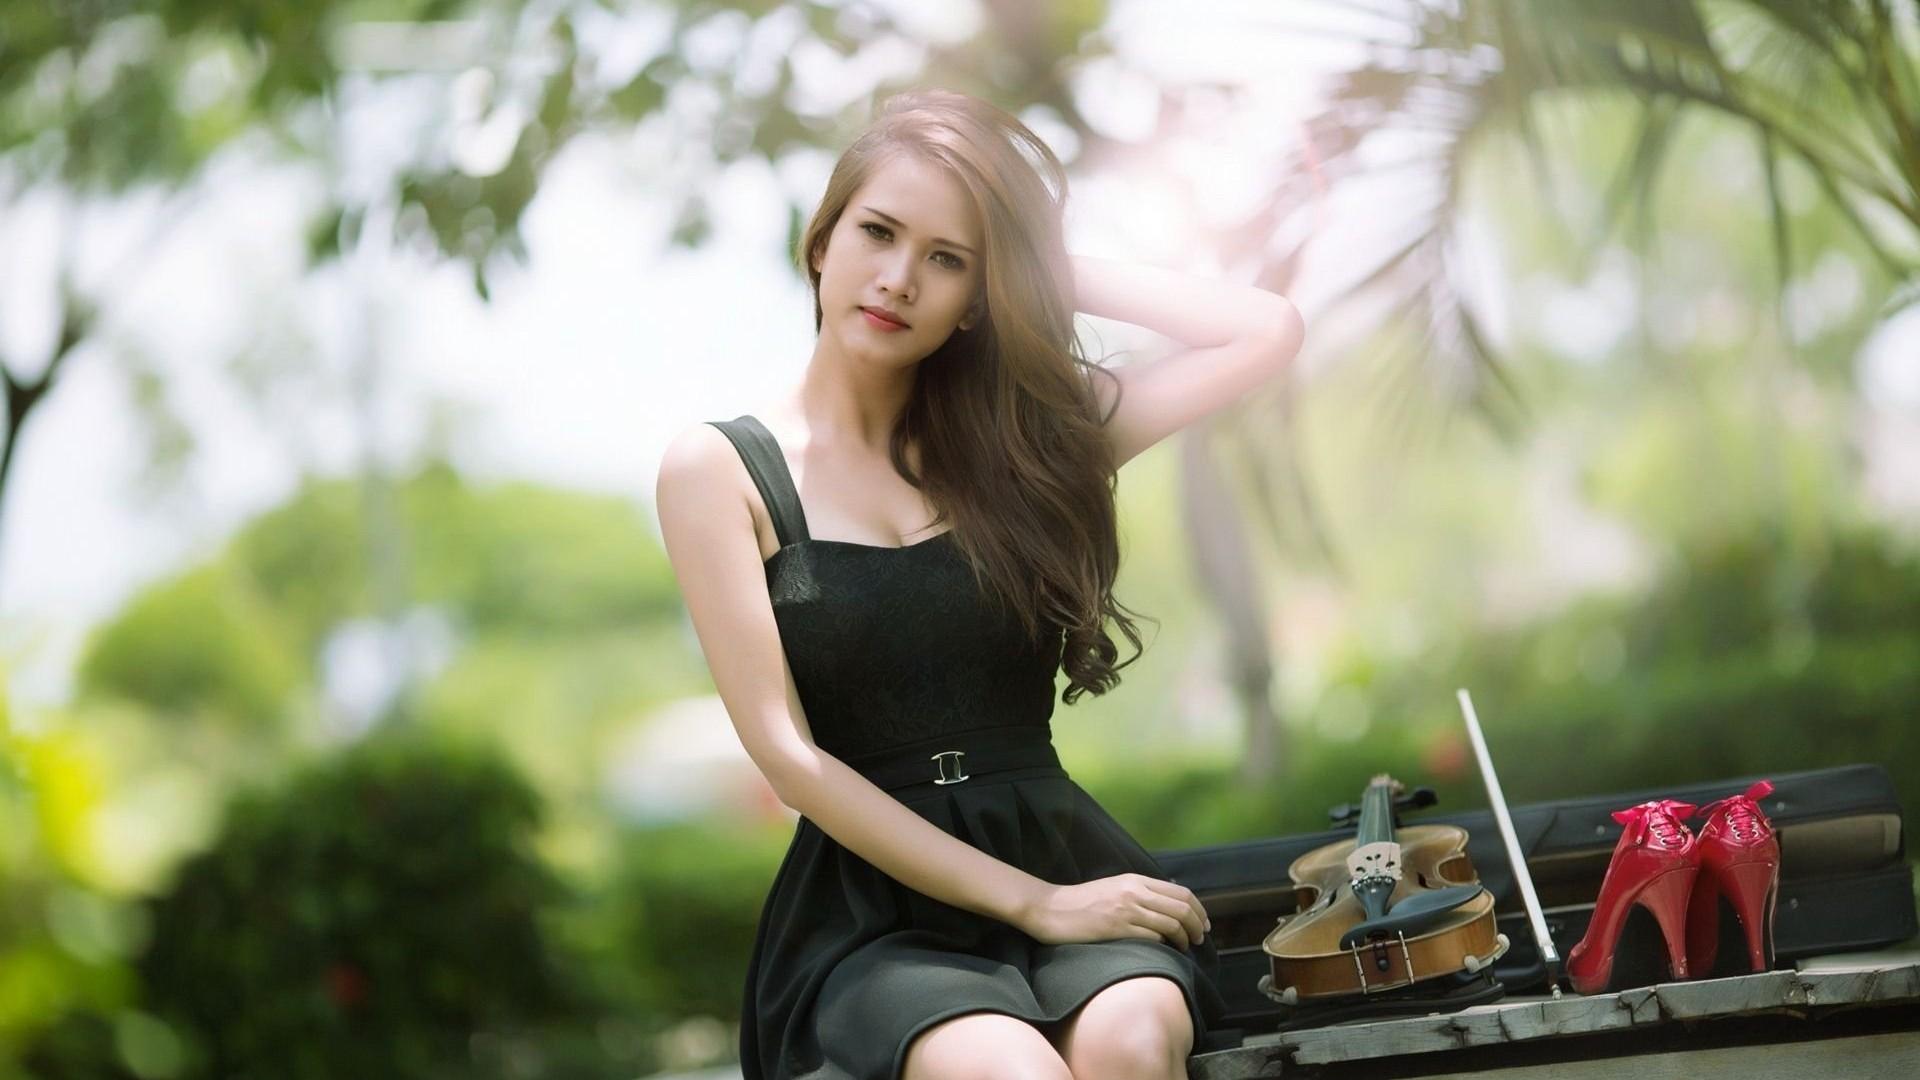 Beautiful women in the world wallpaper